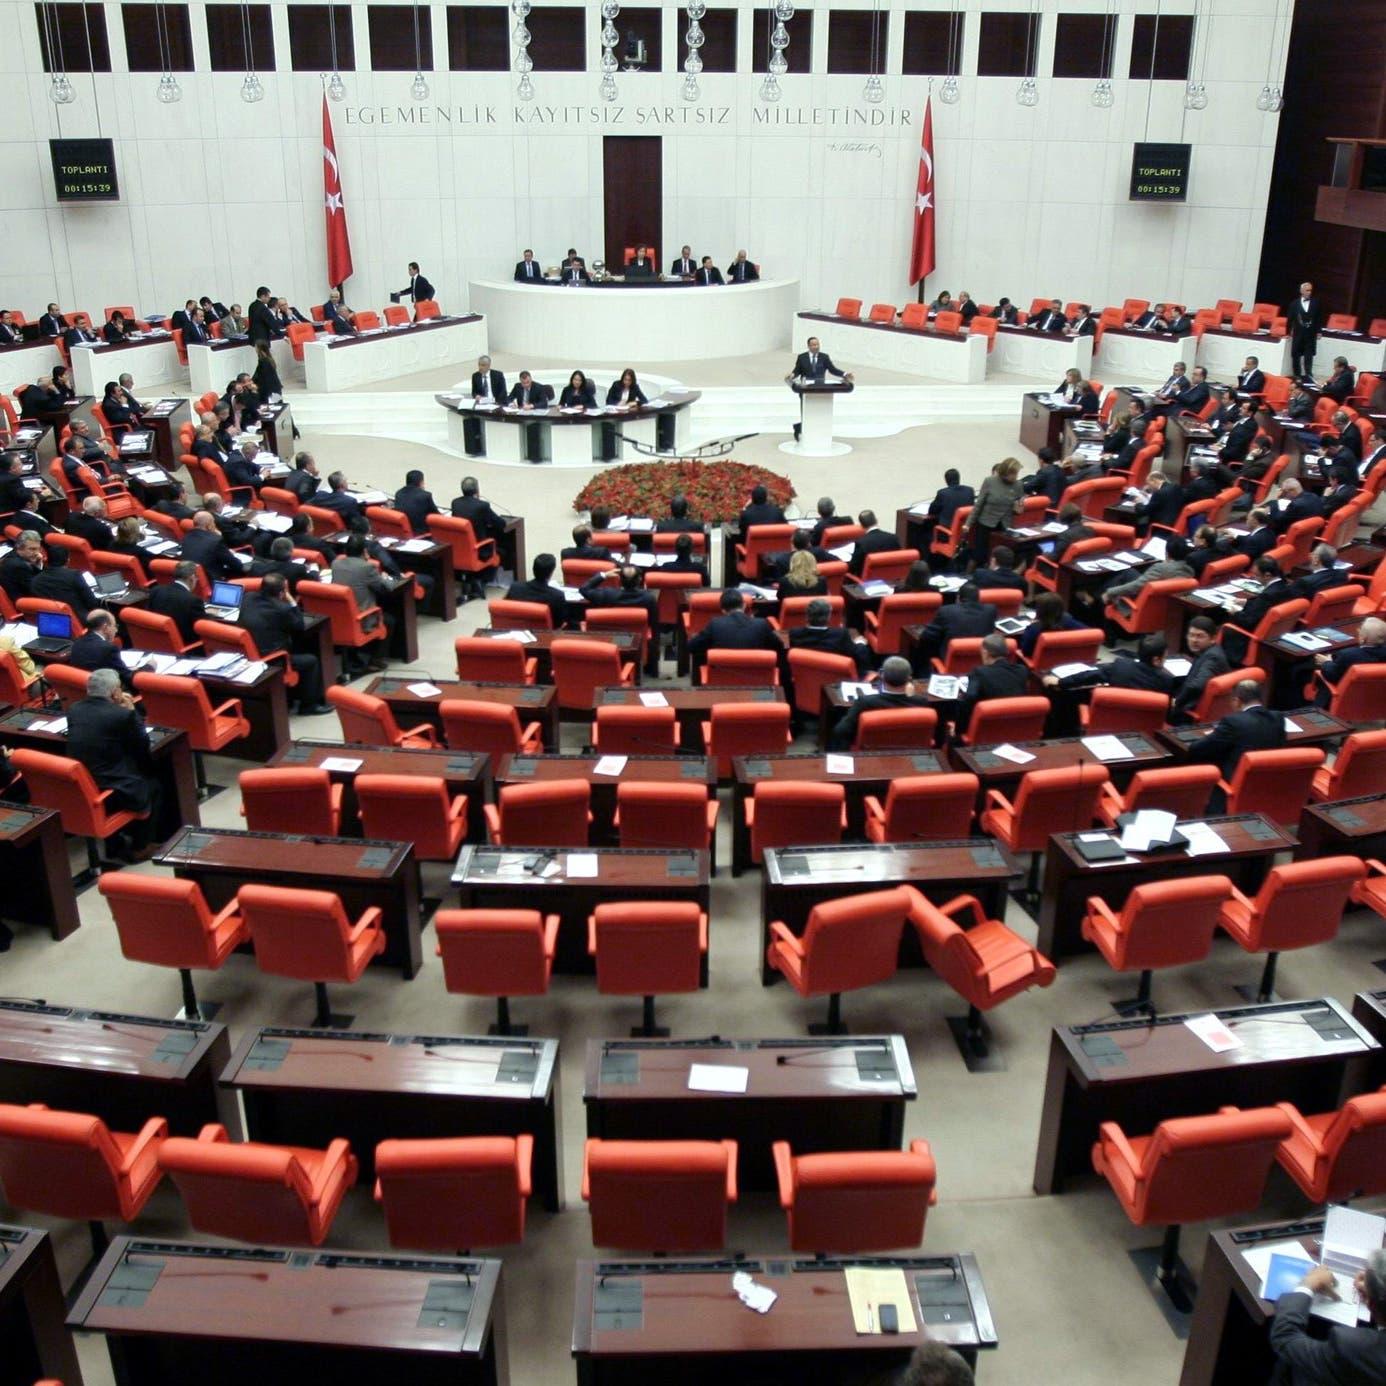 برلمان تركيا يدرس مشروع قانون لنشر قوات في ليبيا